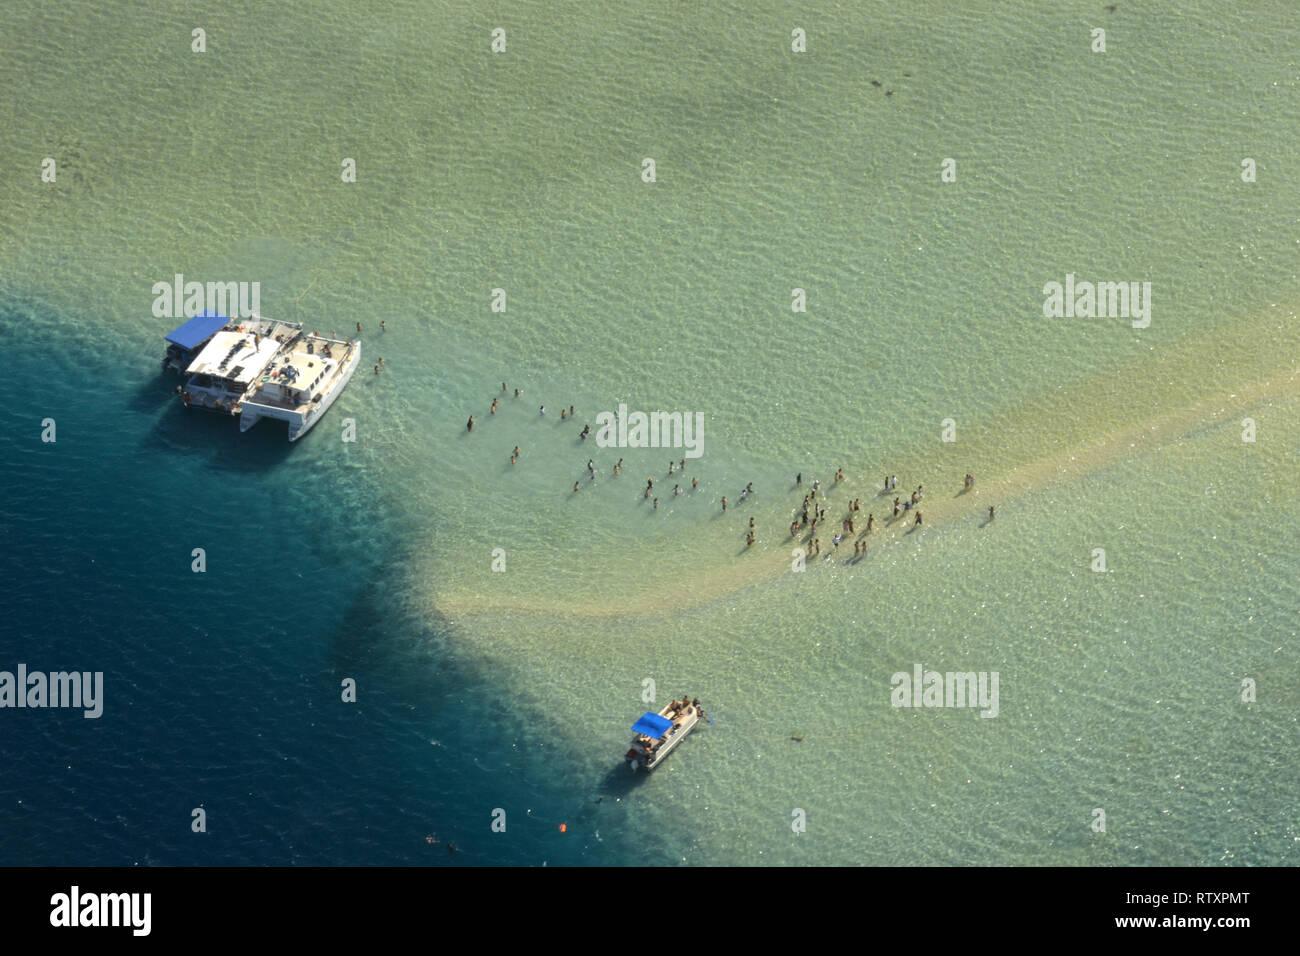 People enjoying the shallow waters of the sandbar in Kaneohe Bay, Oahu, Hawaii, USA - Stock Image